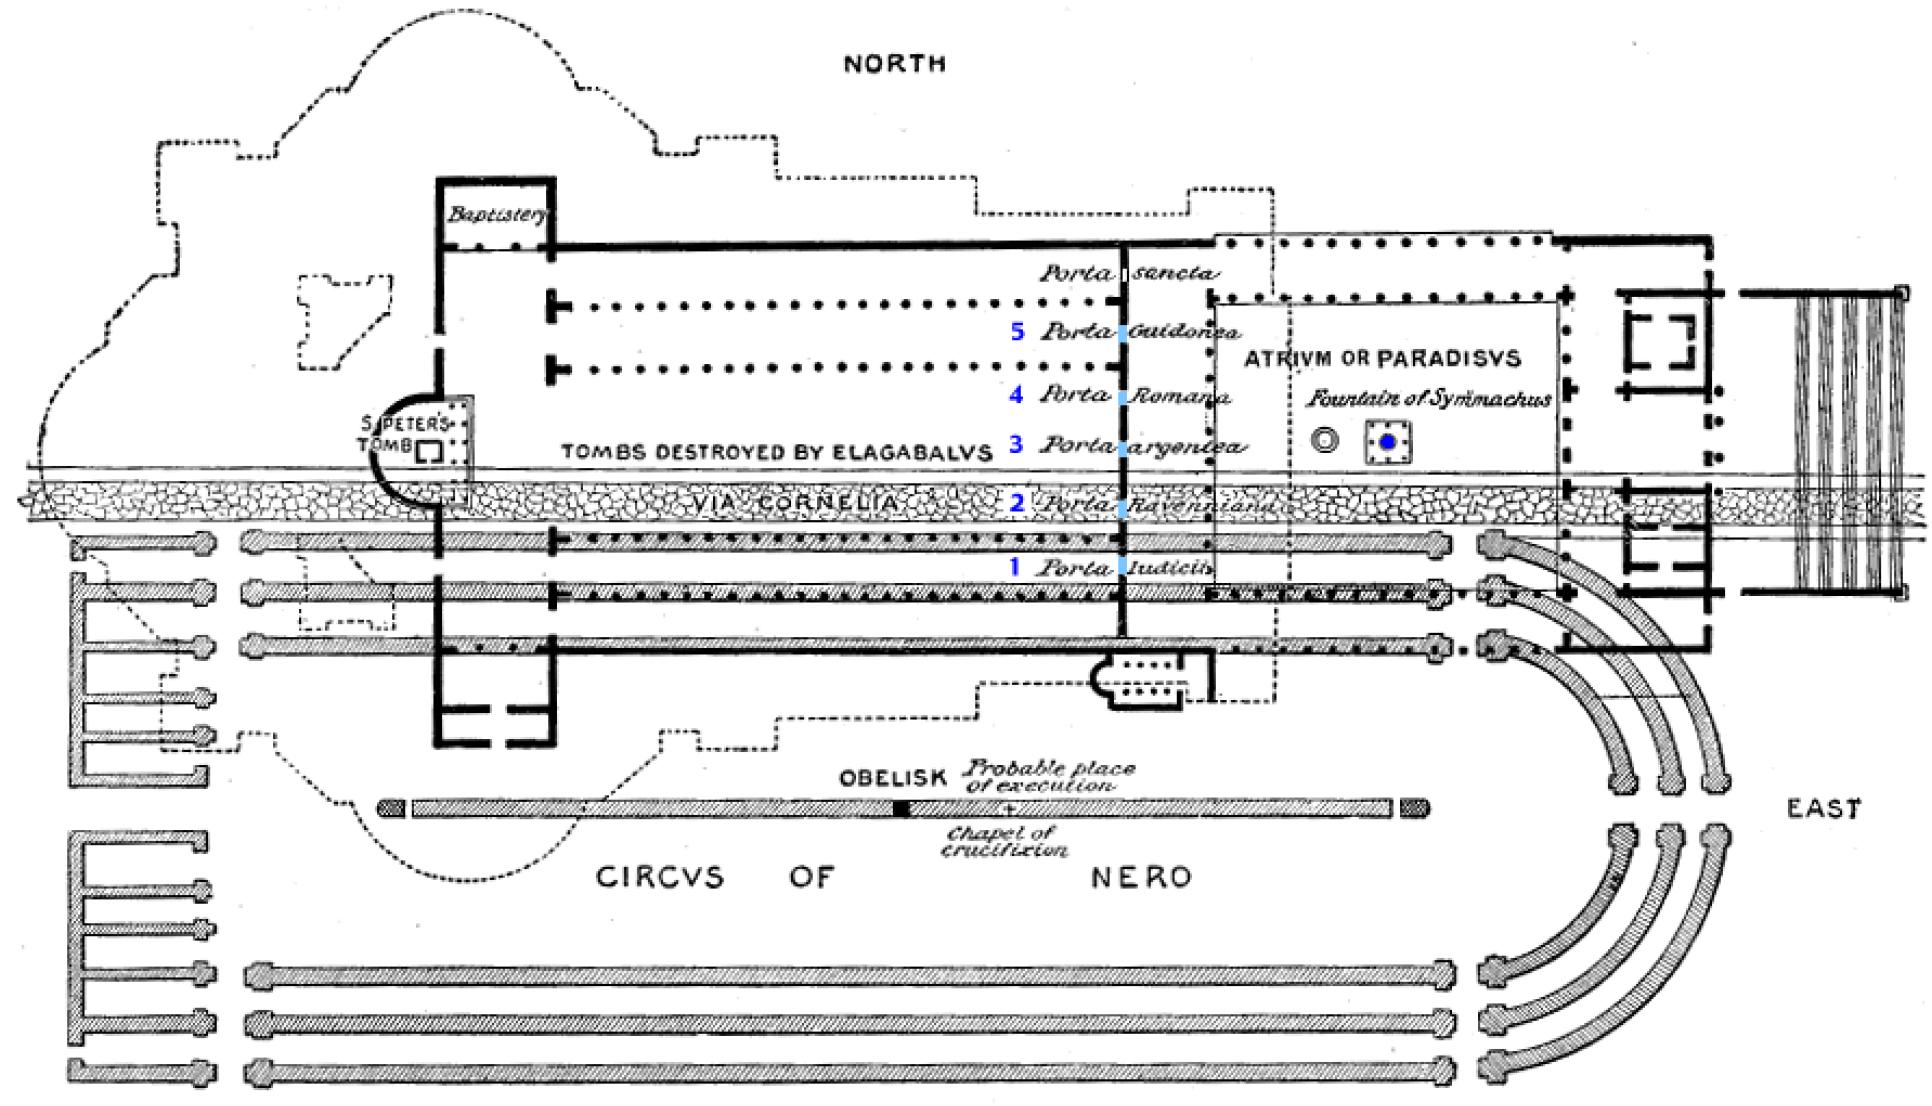 neros-circus-and-st-peter-basilica-3